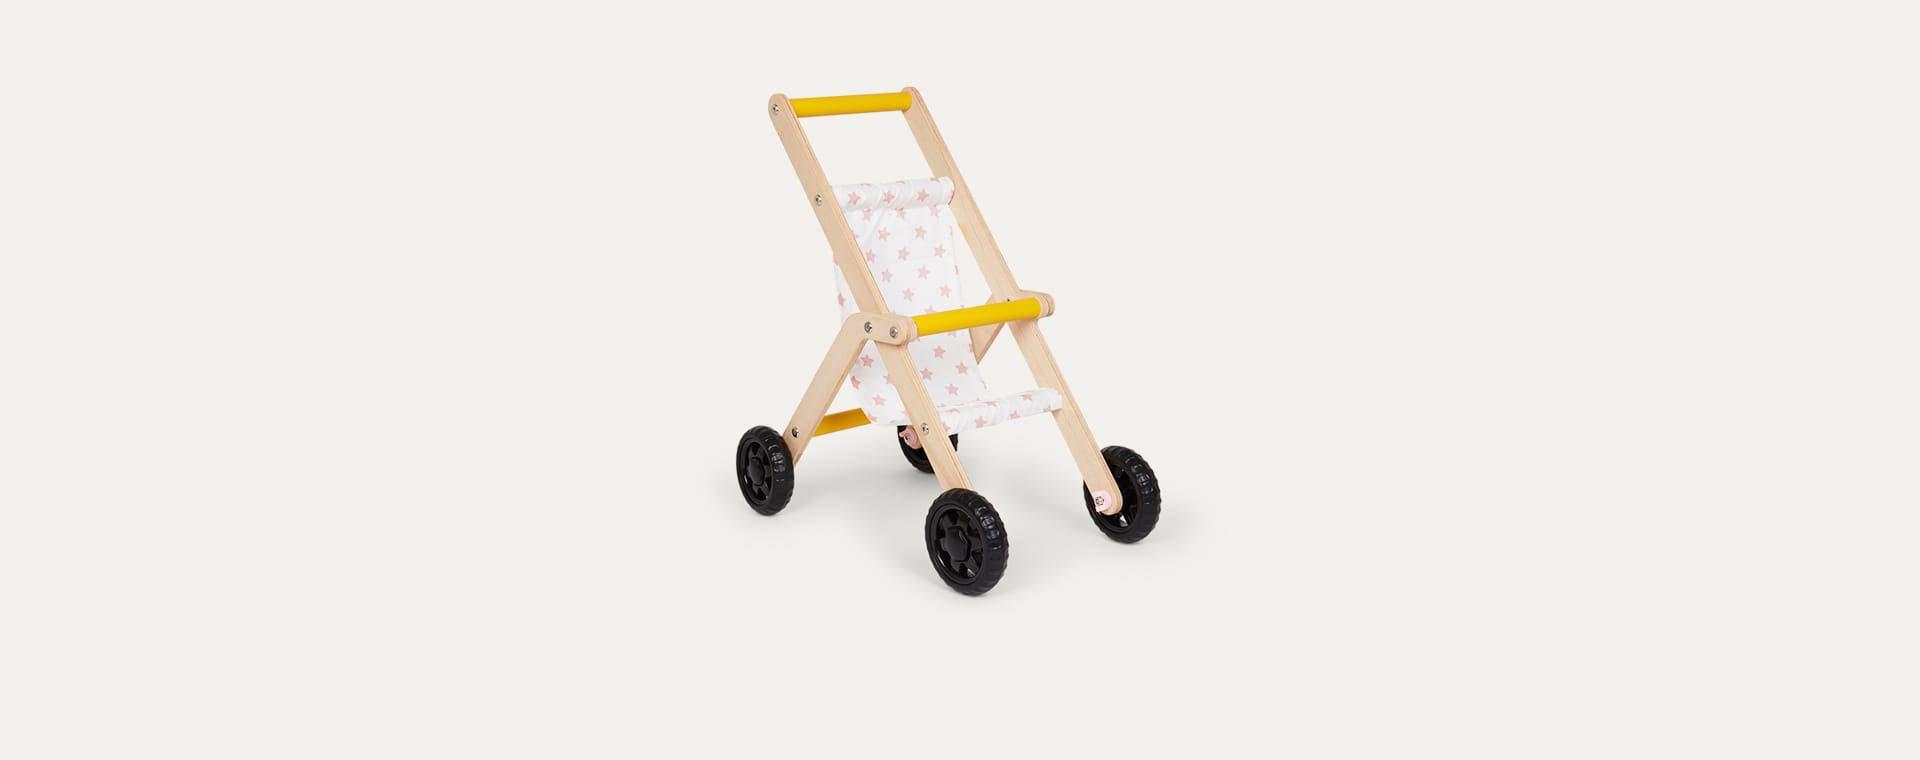 Wood Mamatoyz Baby Stroller